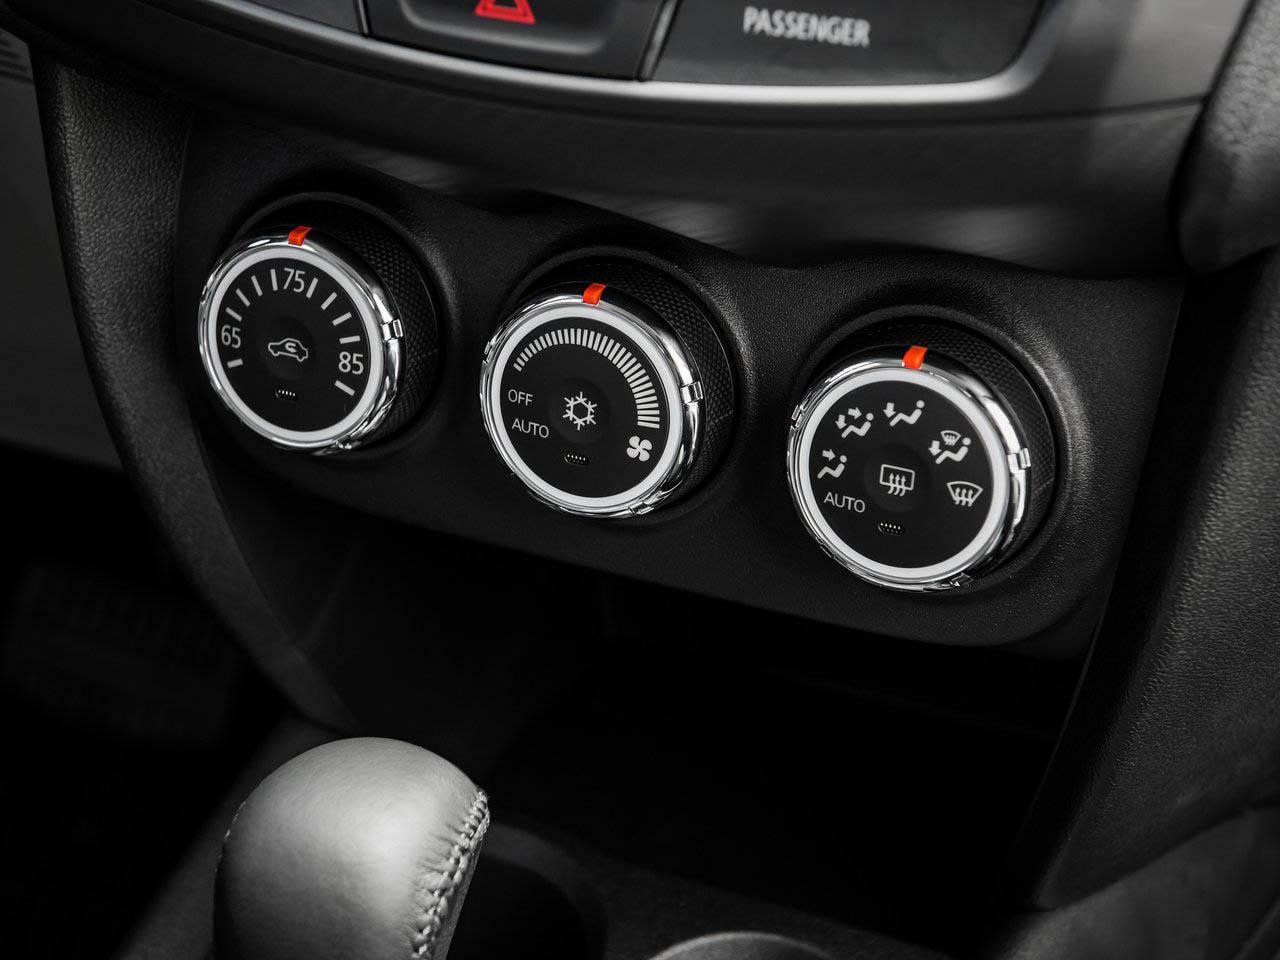 Mitsubishi ASX Interior نمای داخلی میتسوبیشی ایاسایکس